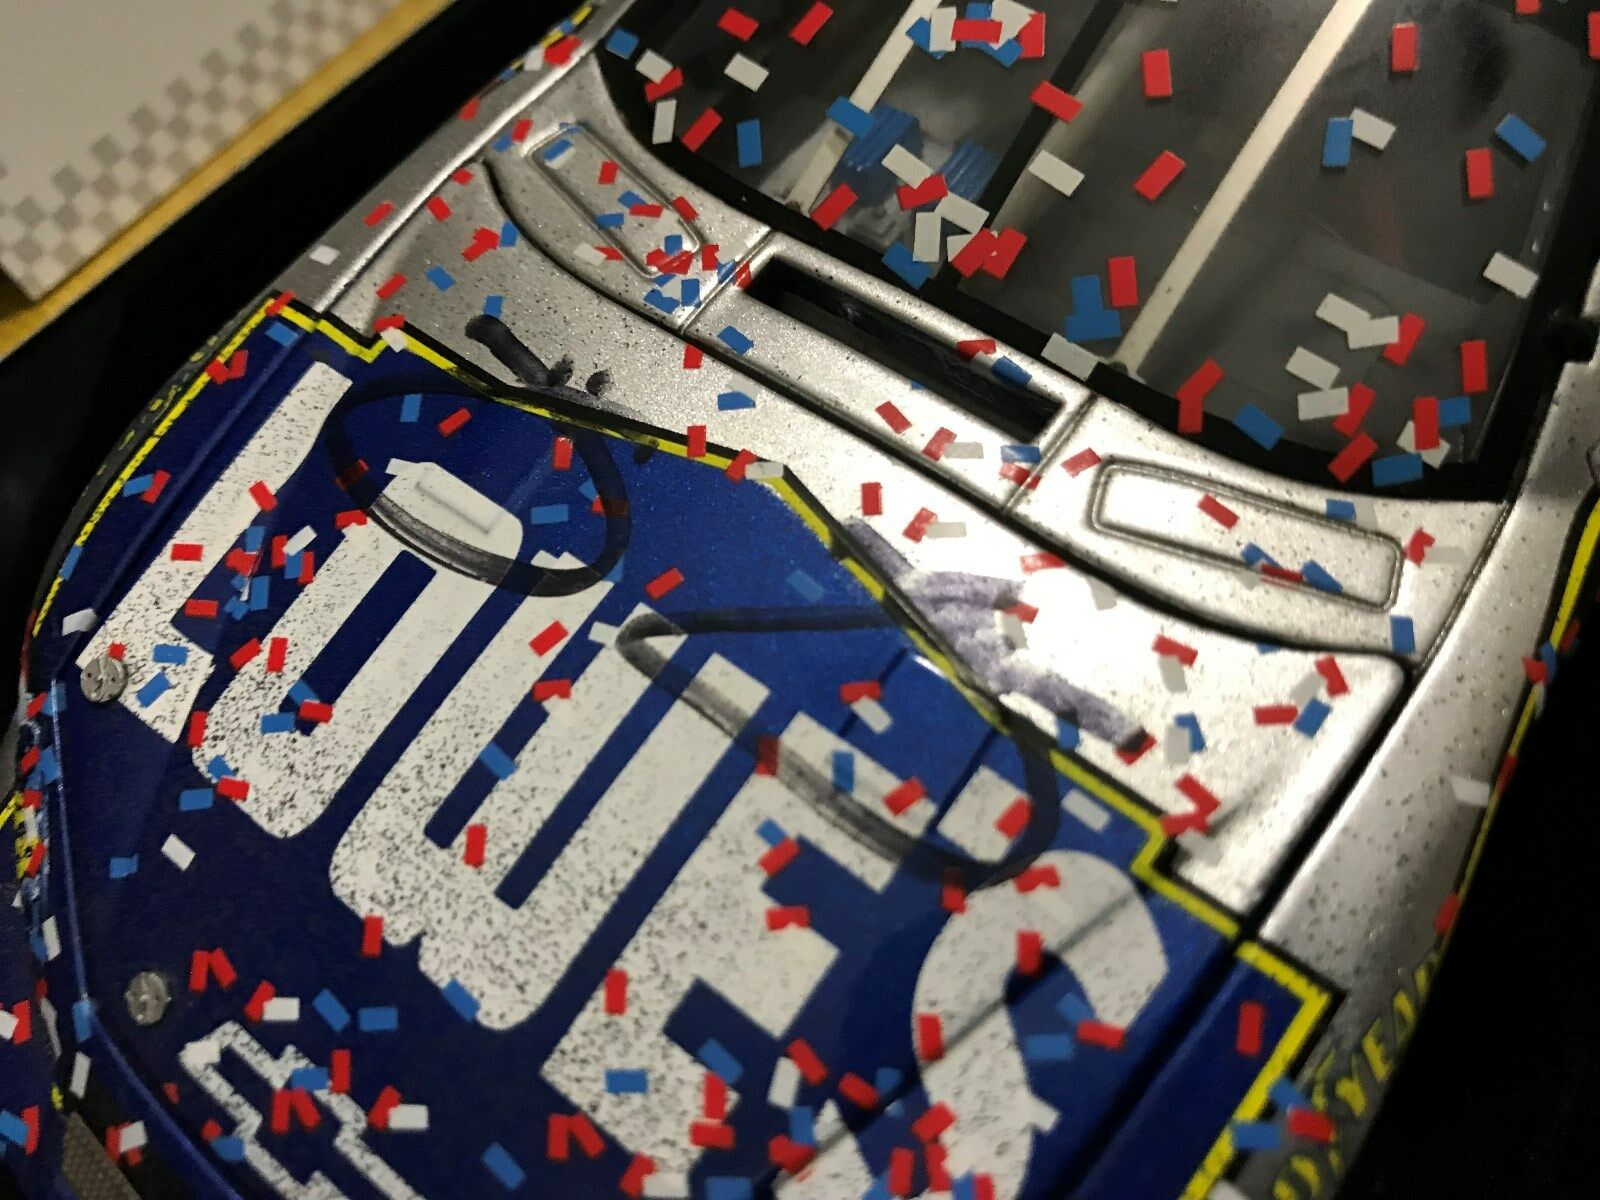 2006 Jimmie Johnson SIGNED Daytona 500 Race Win Lowes Champ Champ Champ ELITE car 1 of 200 8b8a94